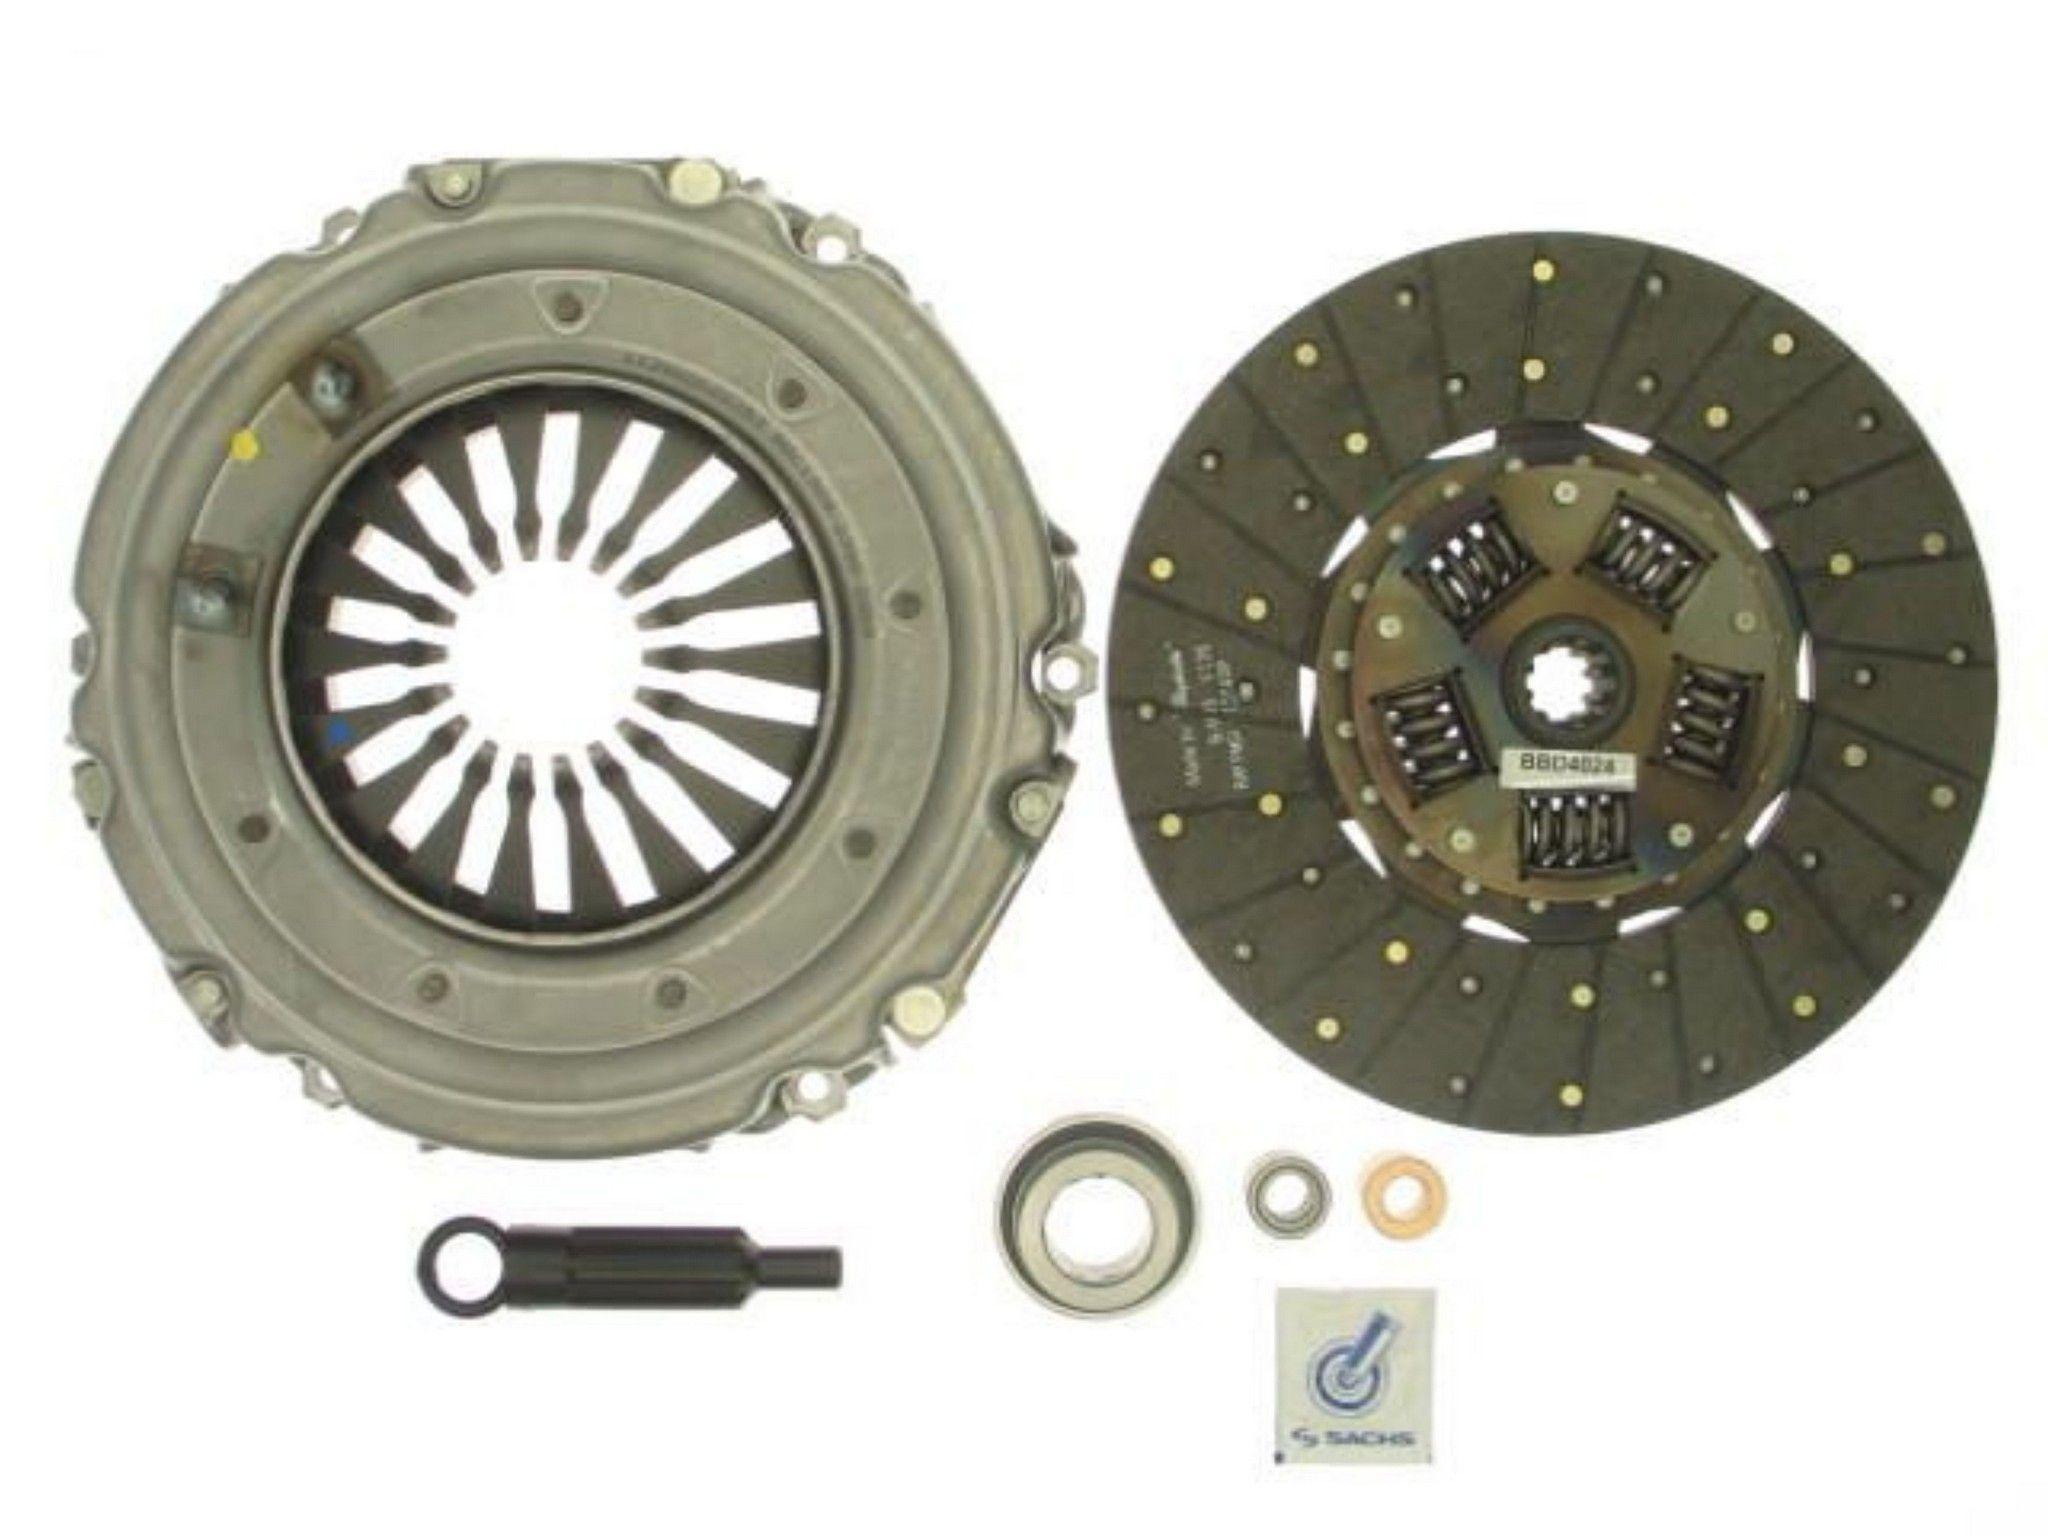 Chevrolet C50 Clutch Kit Replacement (LuK, Rhino Pac, Sachs